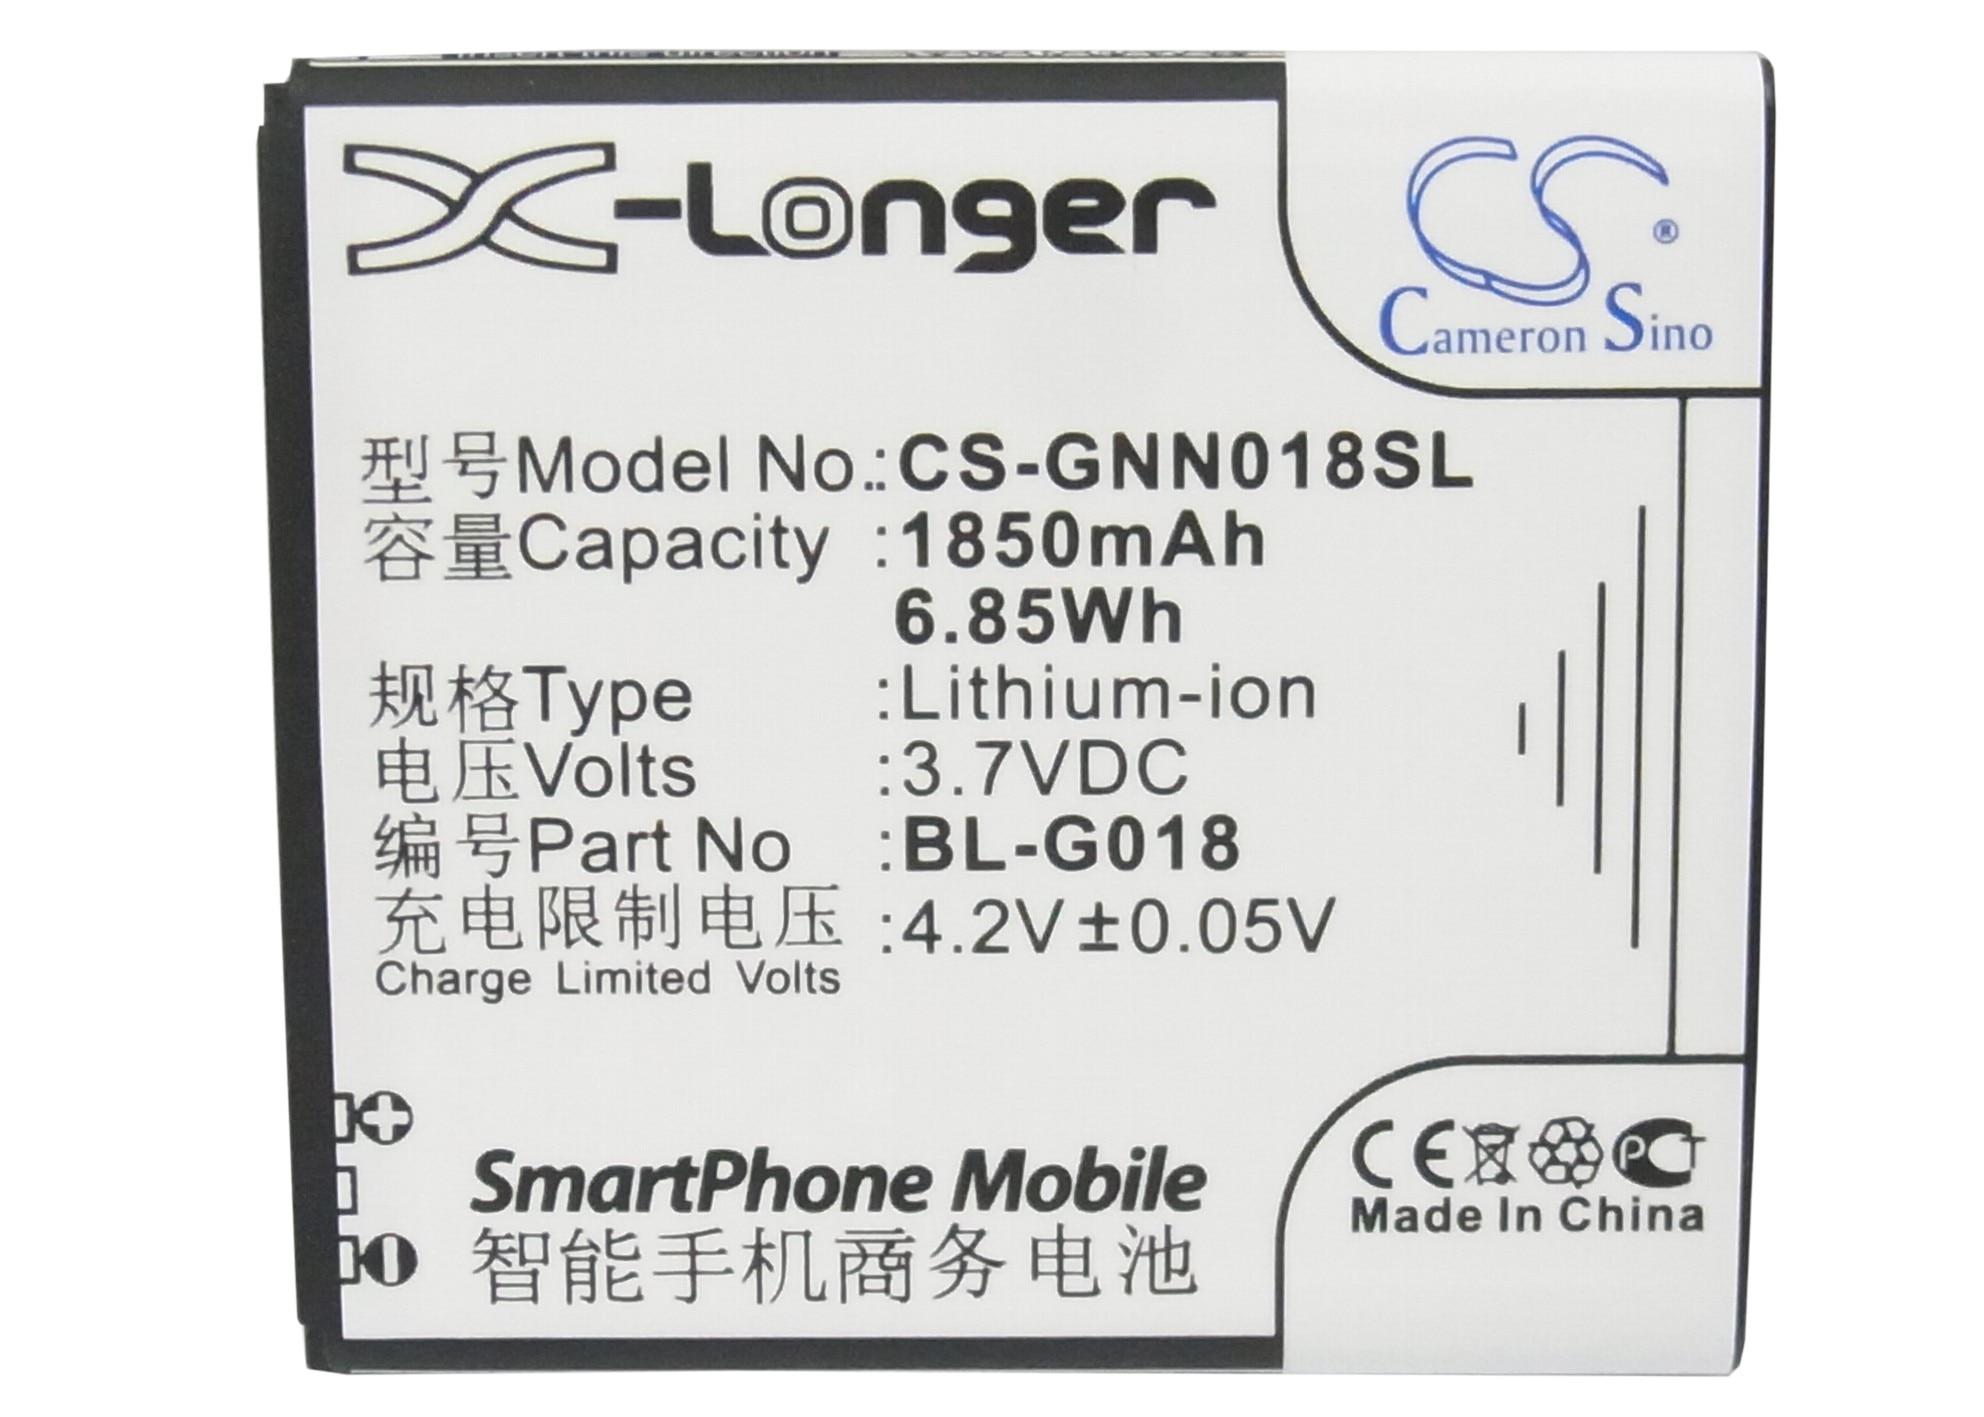 Cameron Sino 1850mAh batería de la batería BL-G018 para volar/GIONEE C700... C800... IQ441... GN206... GN700T/GN700W para NGM WEMOVE WILCO